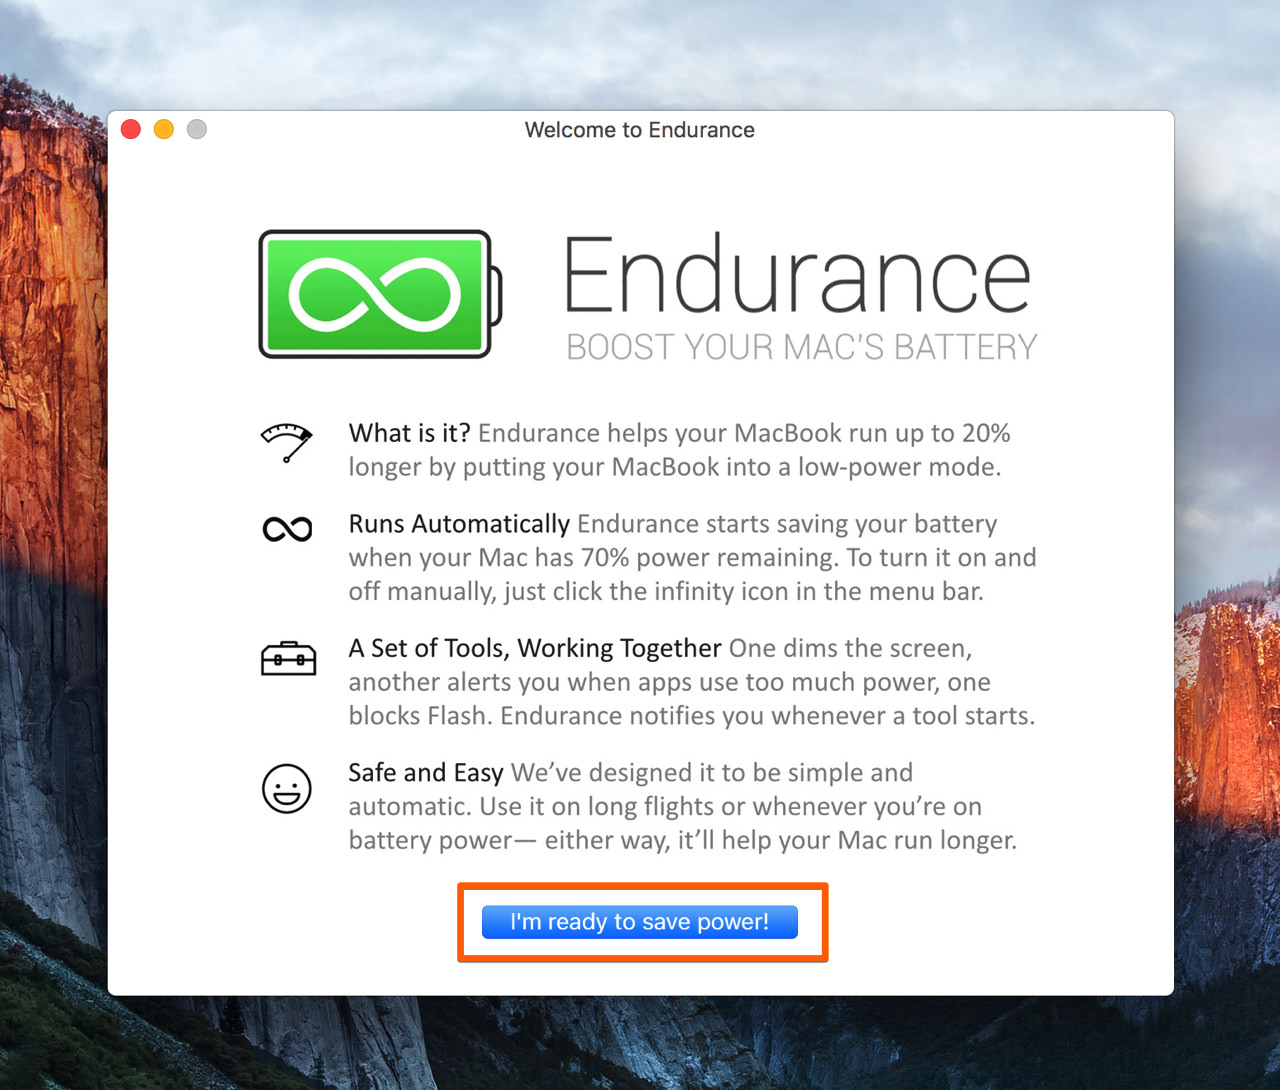 Endurance5